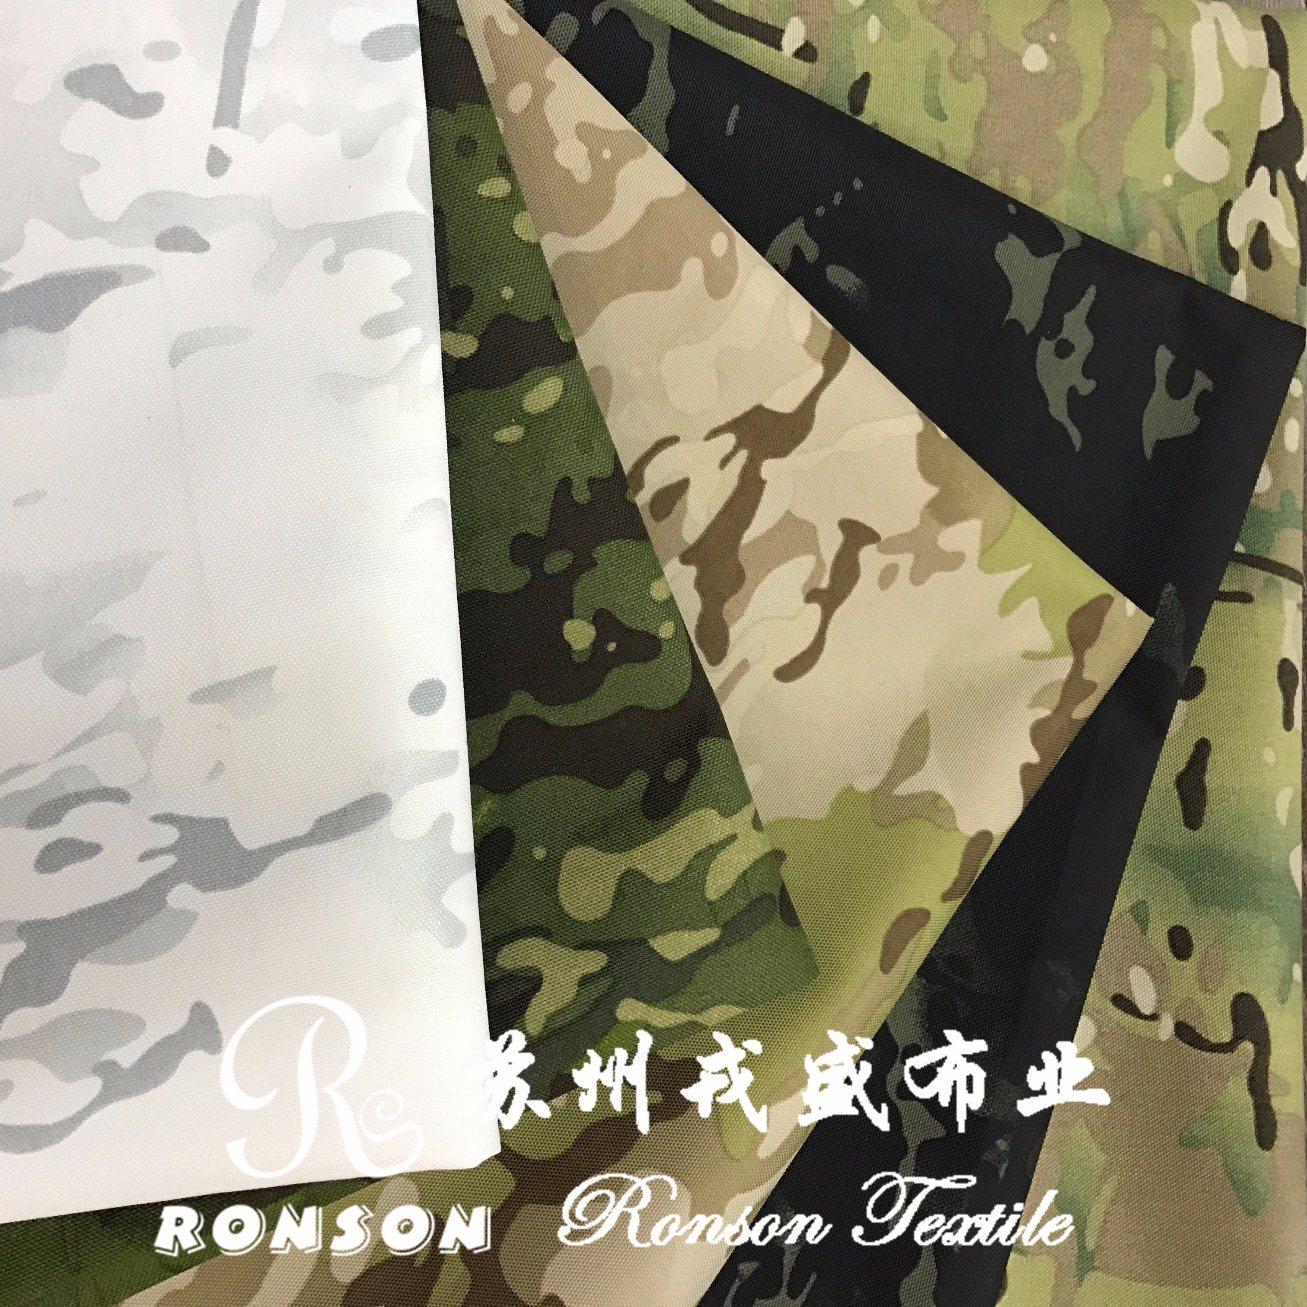 Multicam Alpine, White Snow Cp Camouflage, Polyester Cordura Fabric